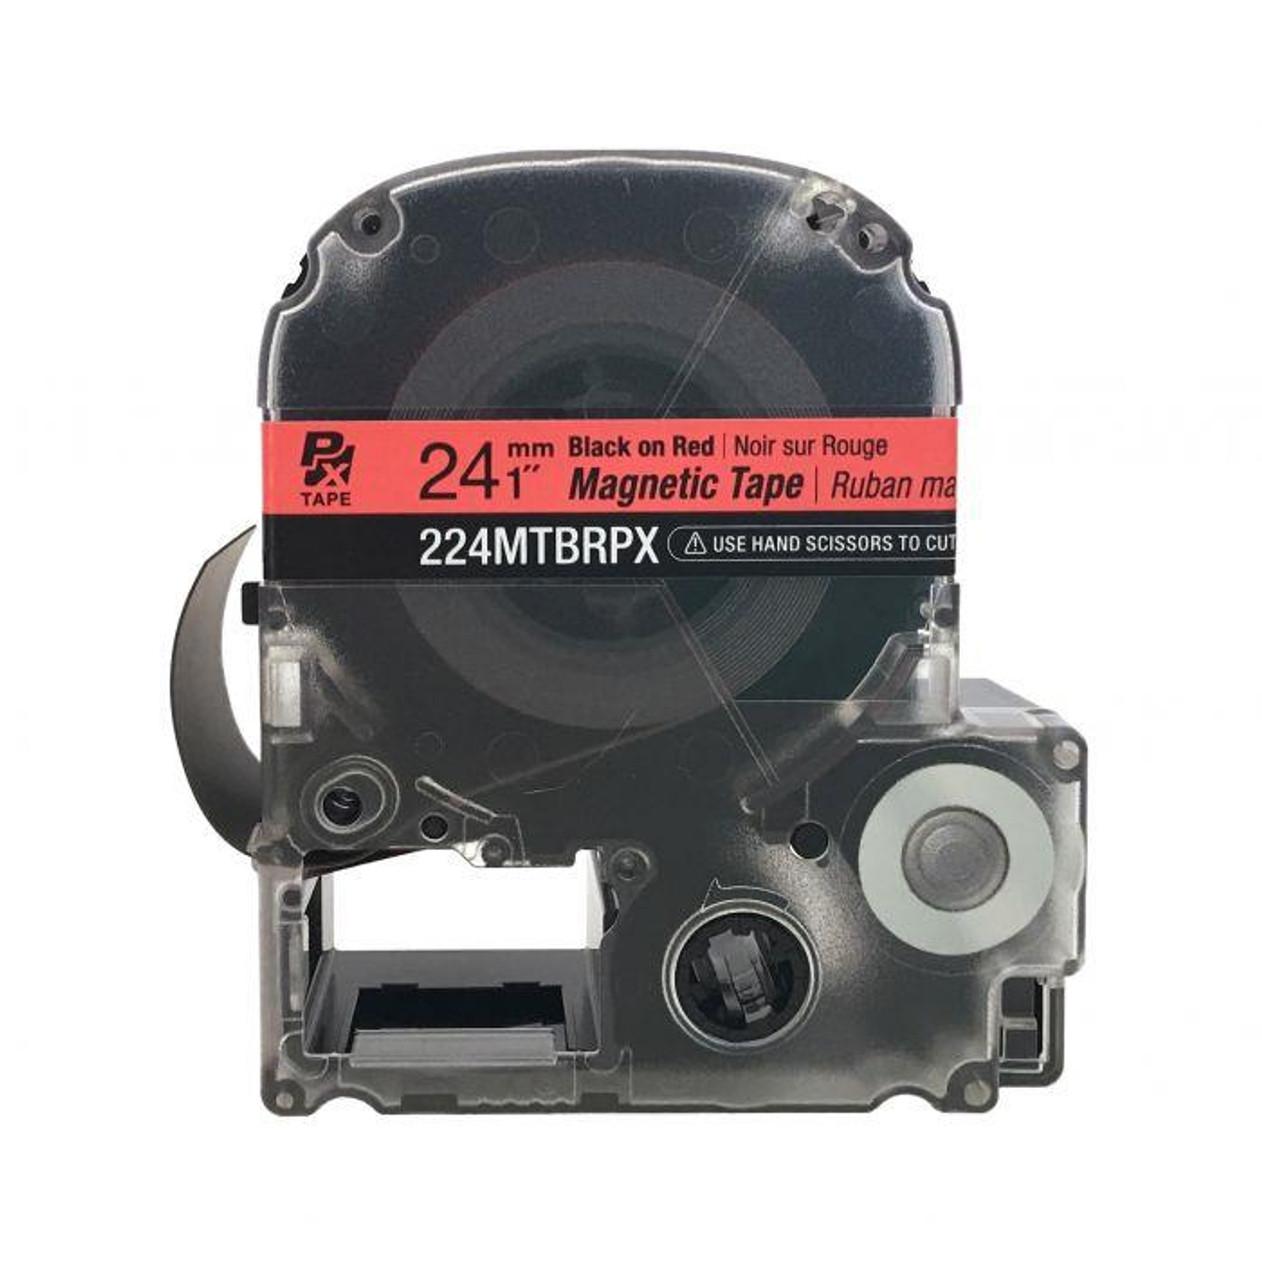 "Epson/K-SUN 224MTBRPX-4.9 BLK ON RED PX Label Tape 1""/24MM Magnet Tape"